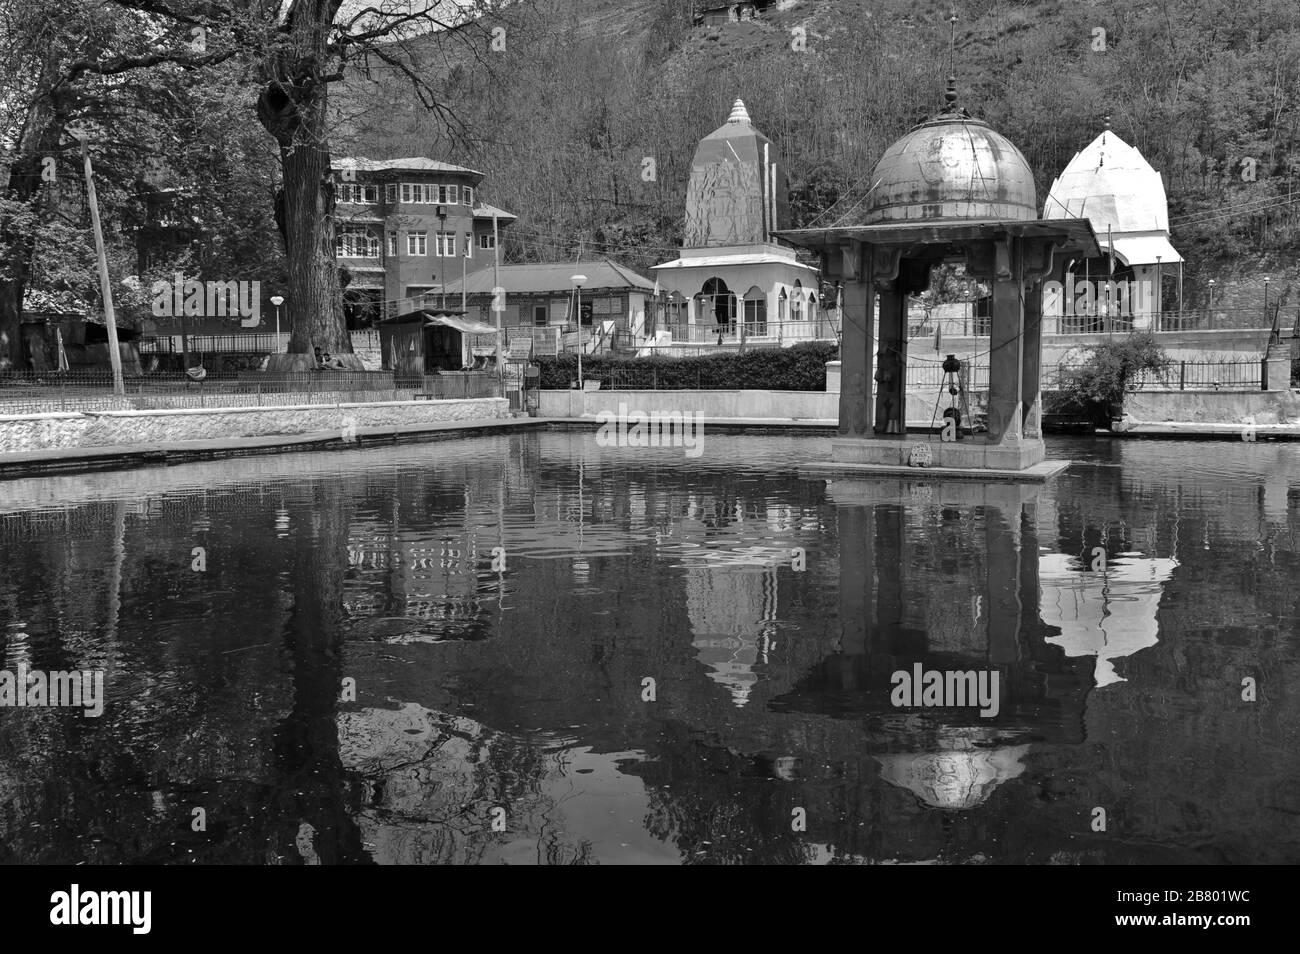 Templo de Ratán, Martand, Anantnag, Cachemira, Jammu y Cachemira, India, Asia Foto de stock